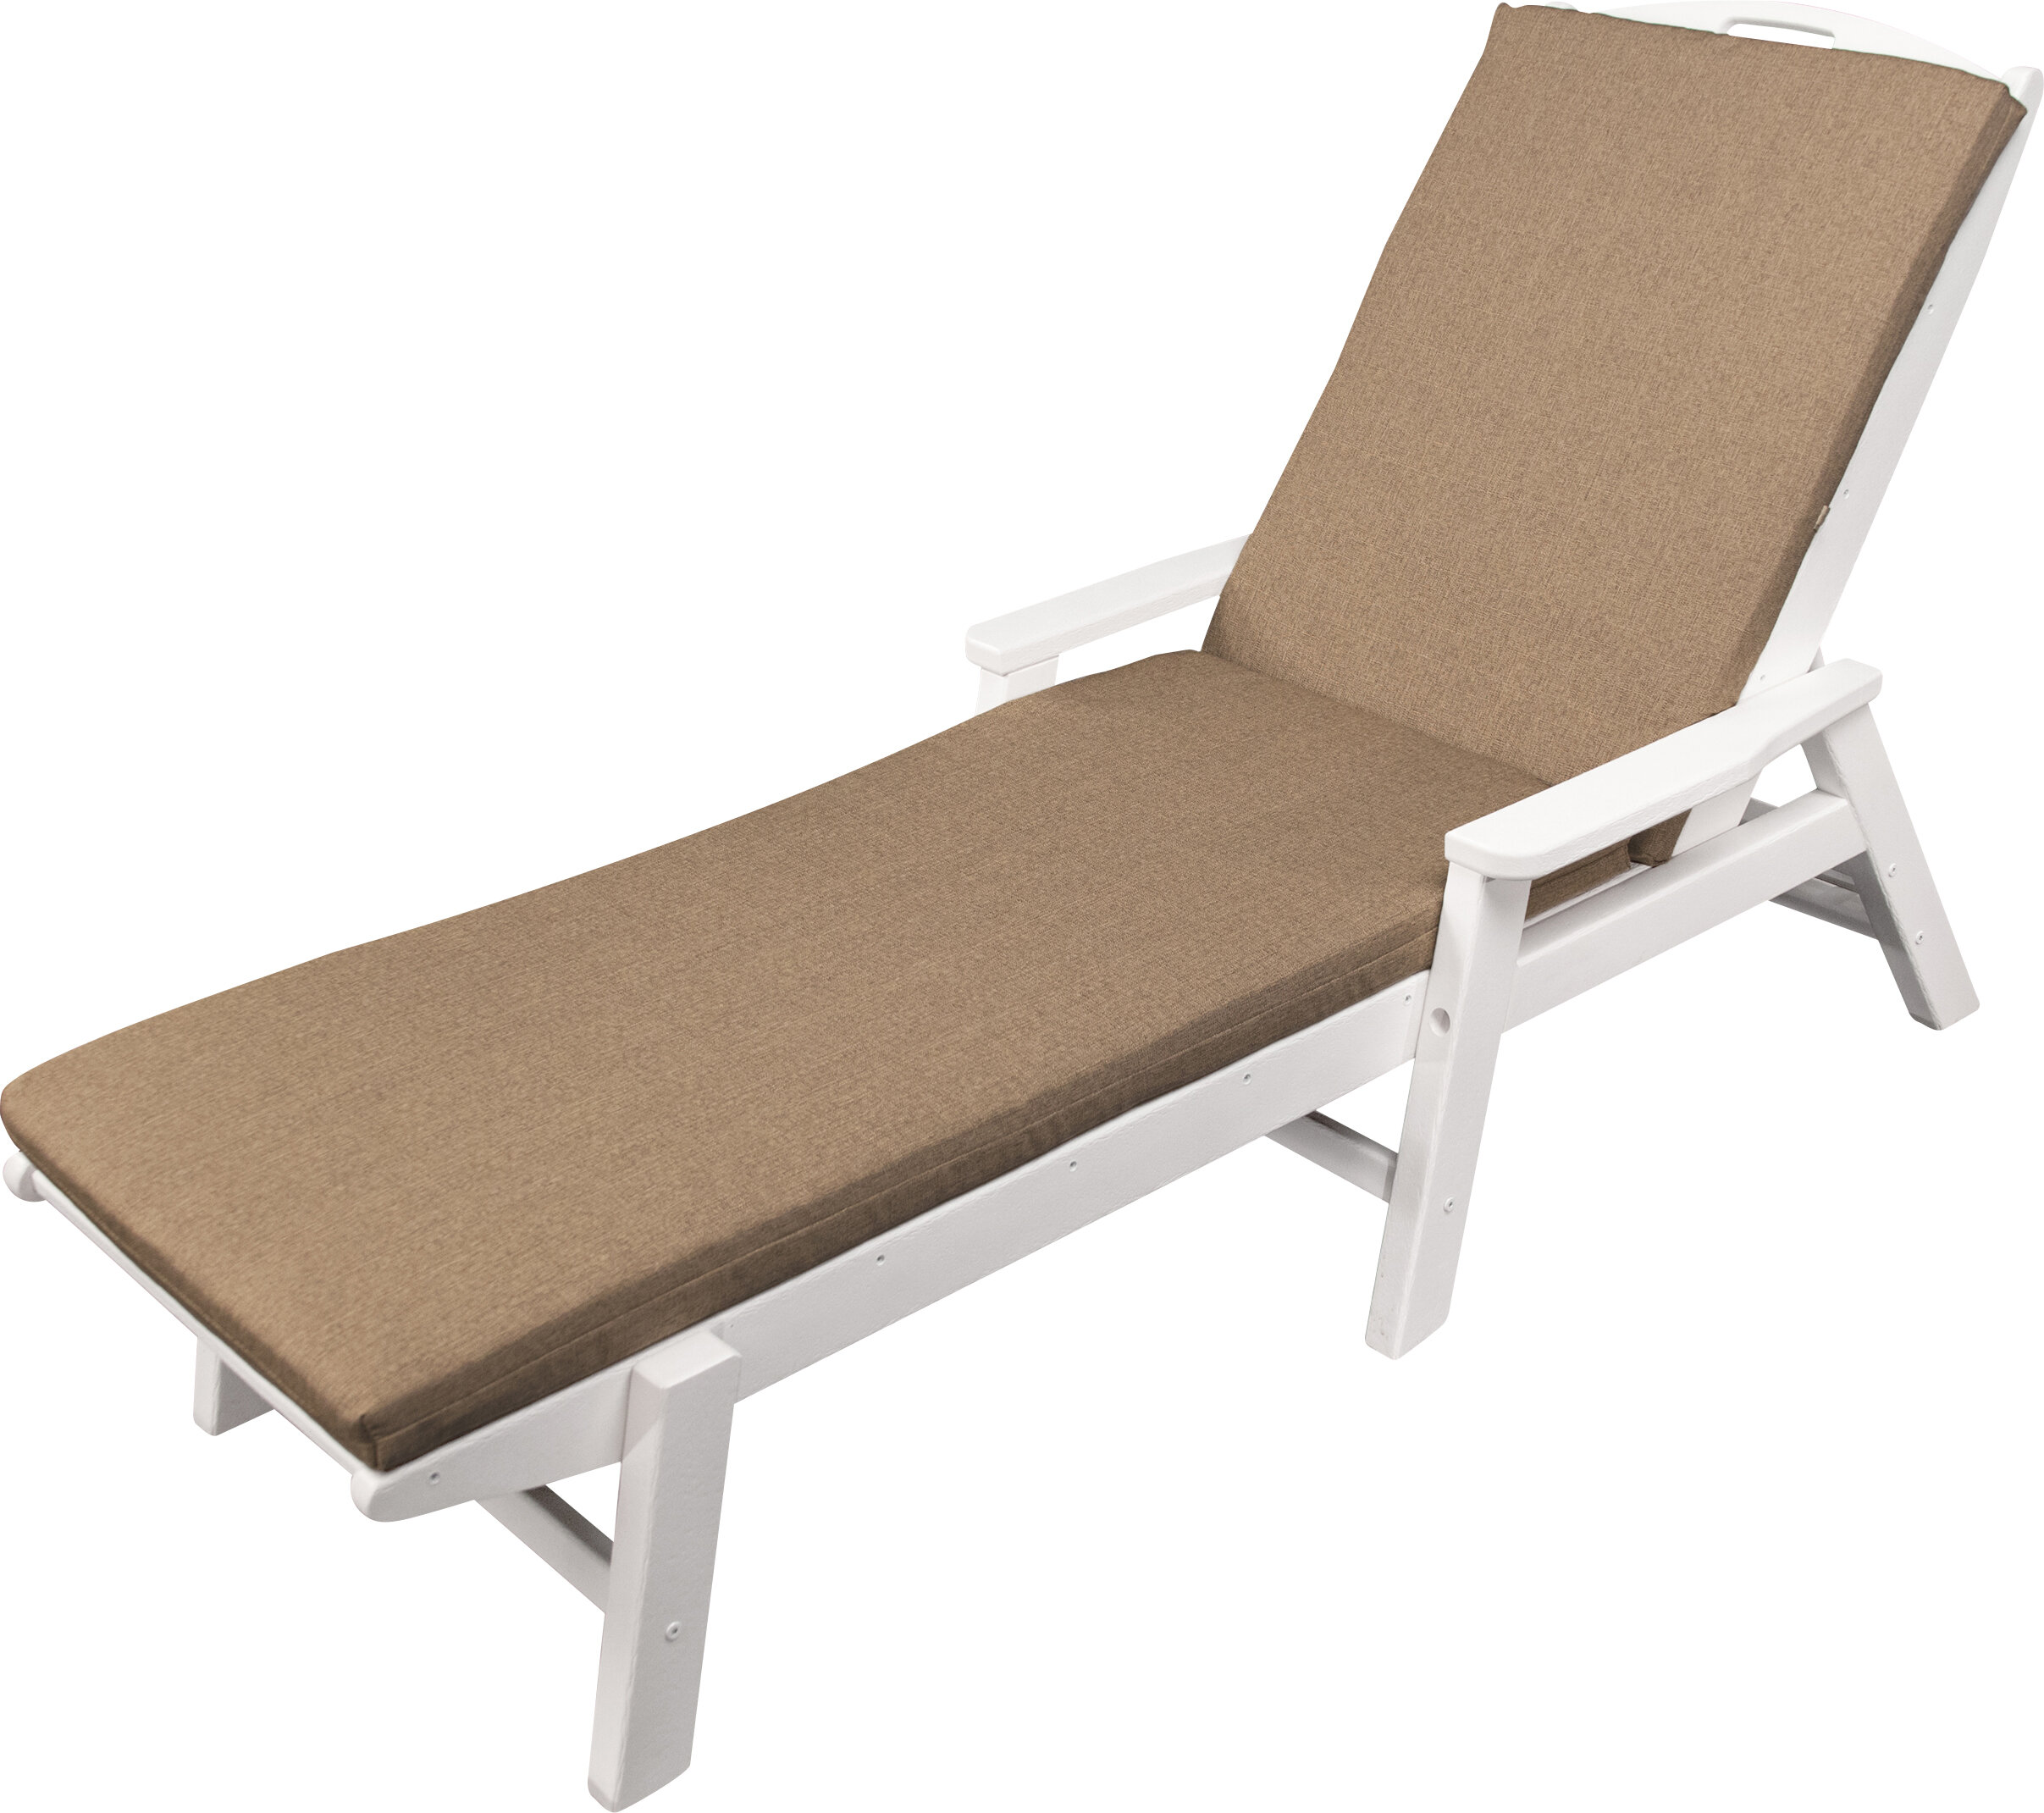 Ateeva outdoor sunbrella chaise lounge cushion wayfair for Bathroom chaise lounge